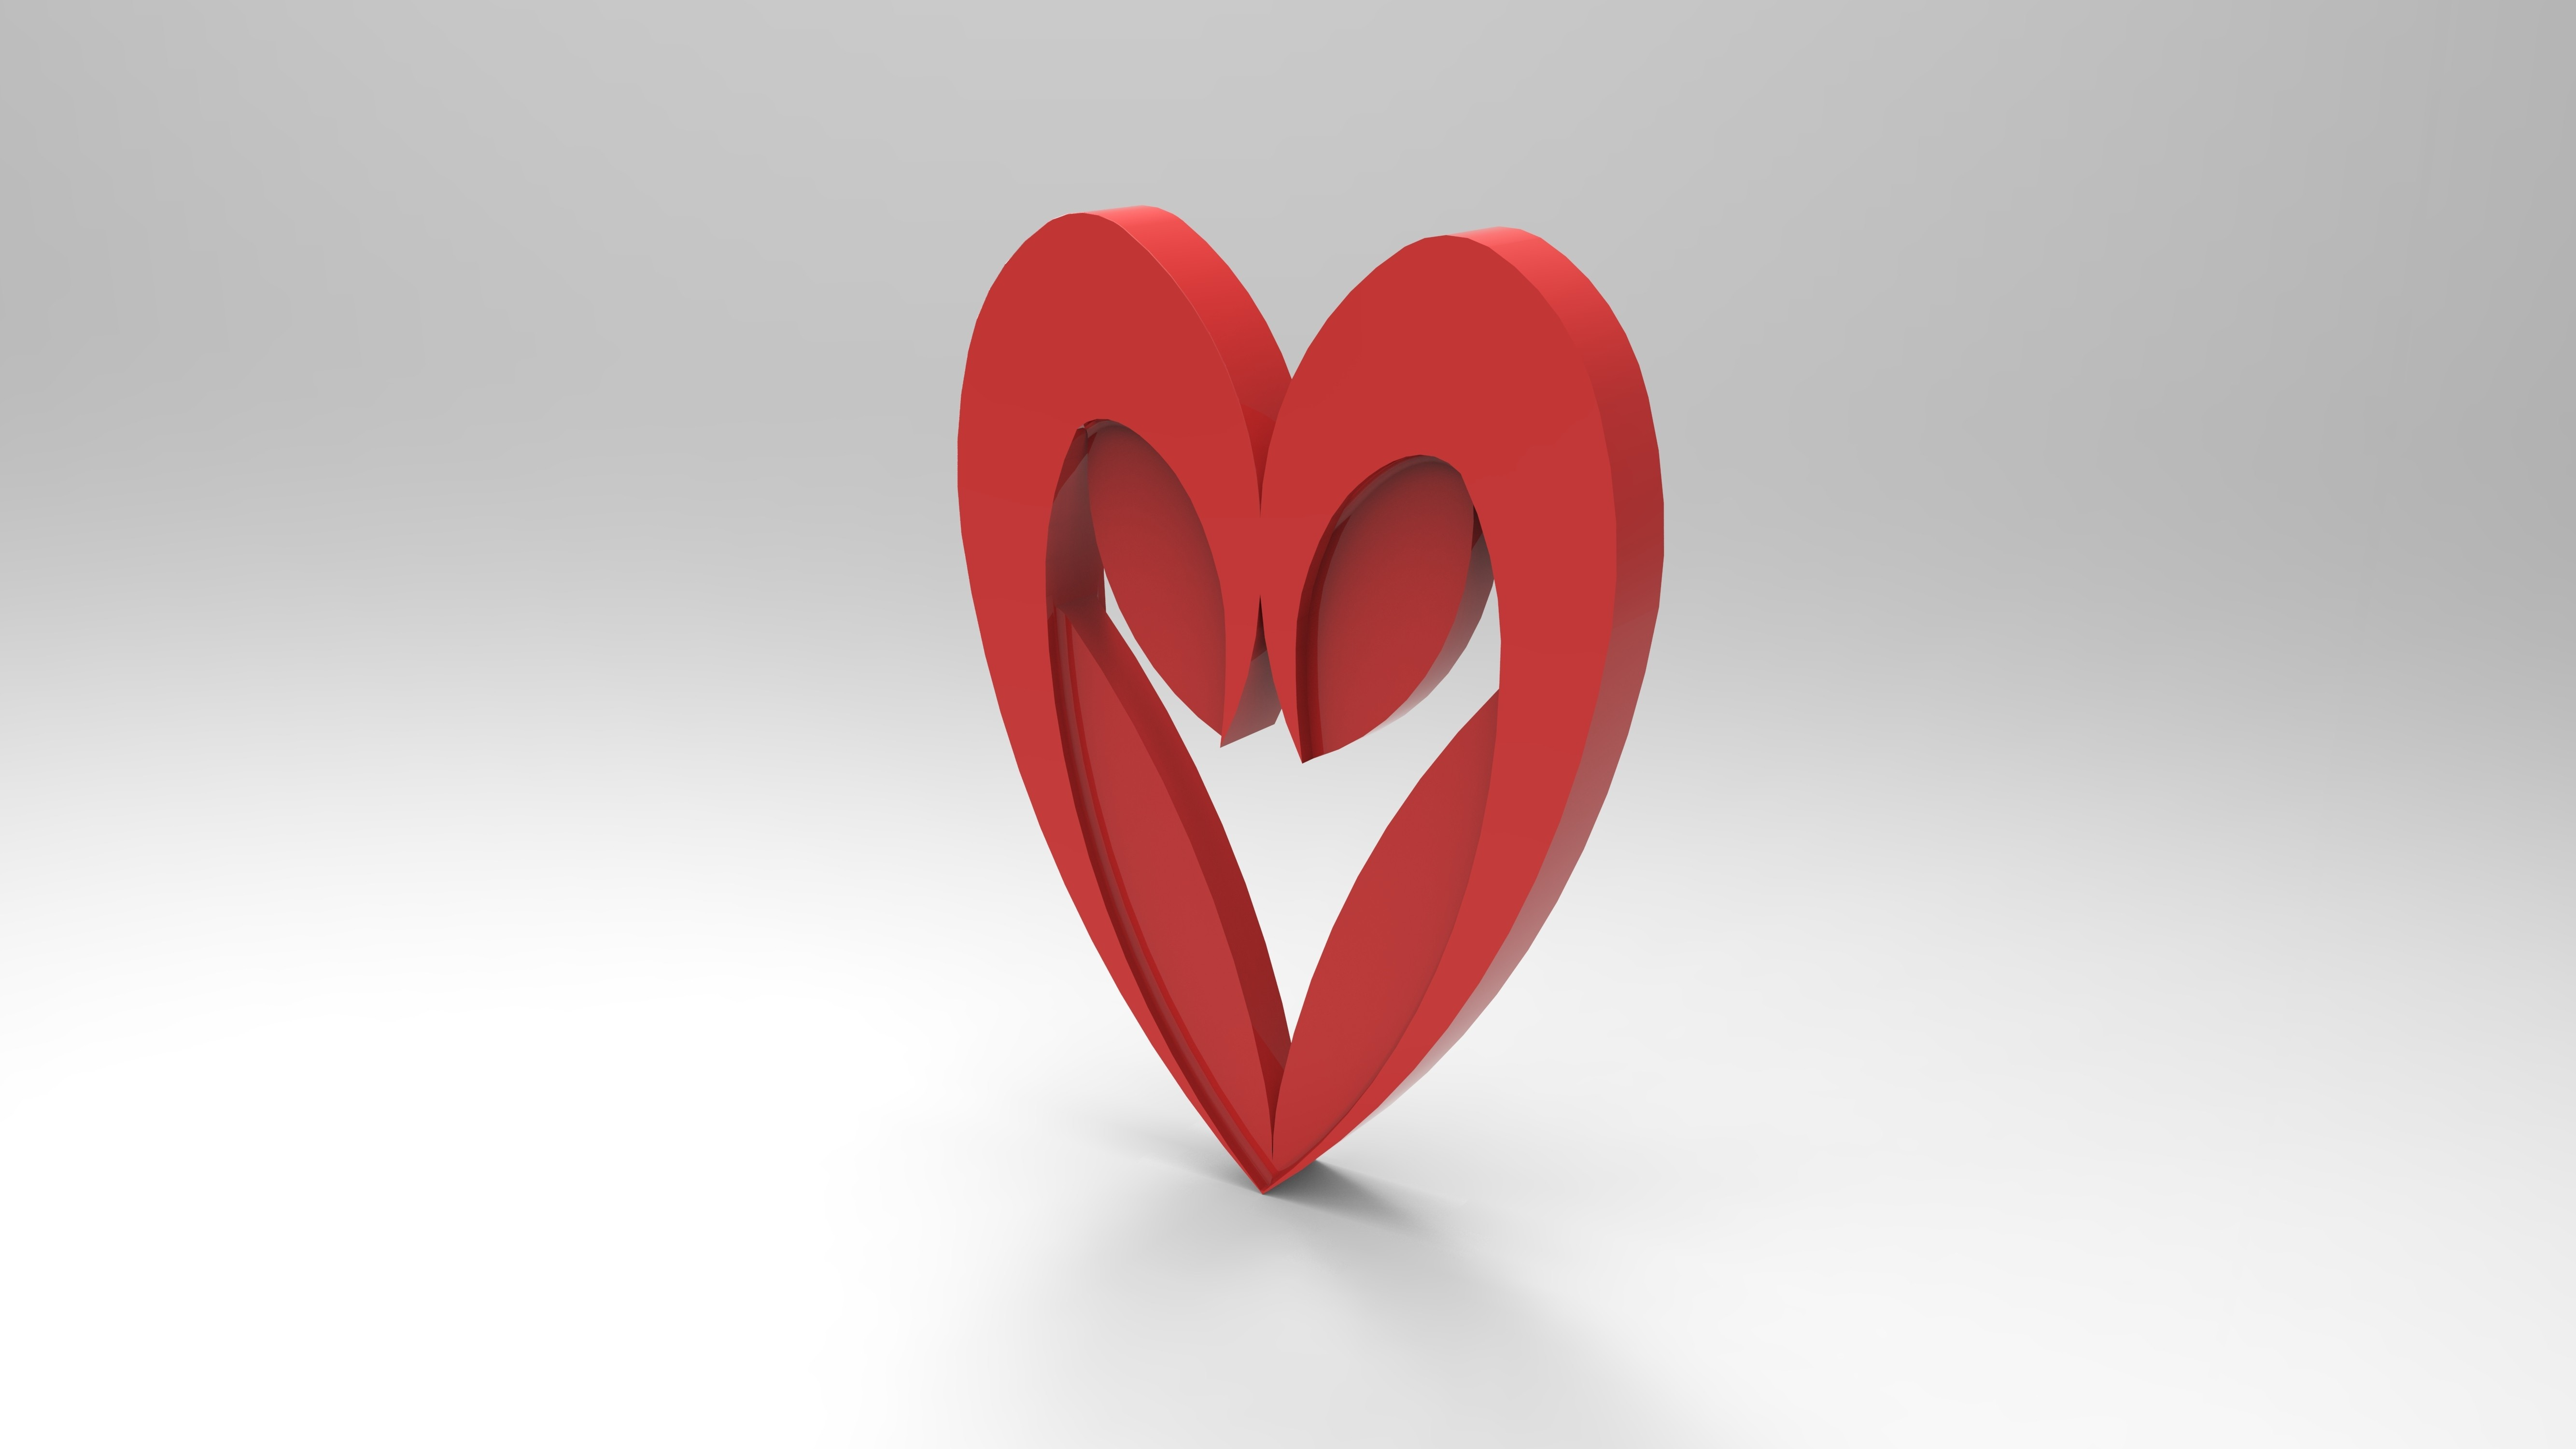 rendu simple rouge.157.jpg Download free STL file Heart from the stratomaker logo • 3D print object, GuilhemPerroud